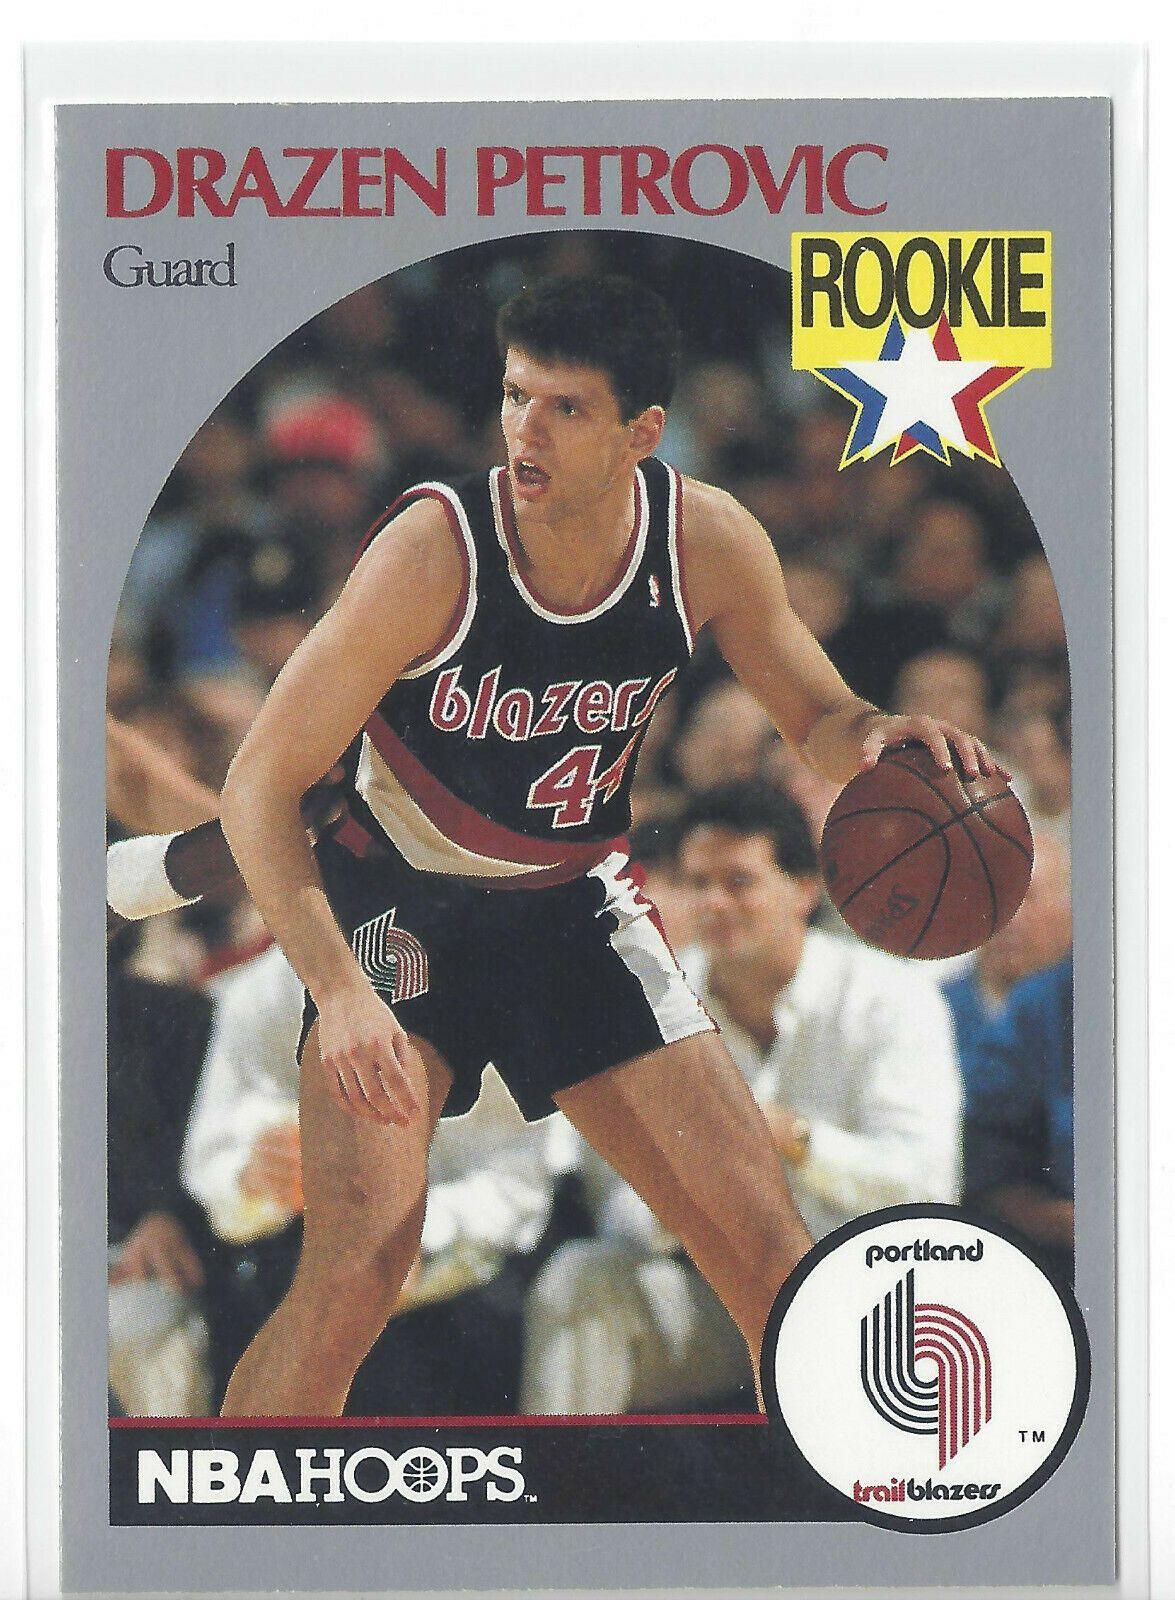 1990 nba hoops drazen petrovic 248 rookie rc card